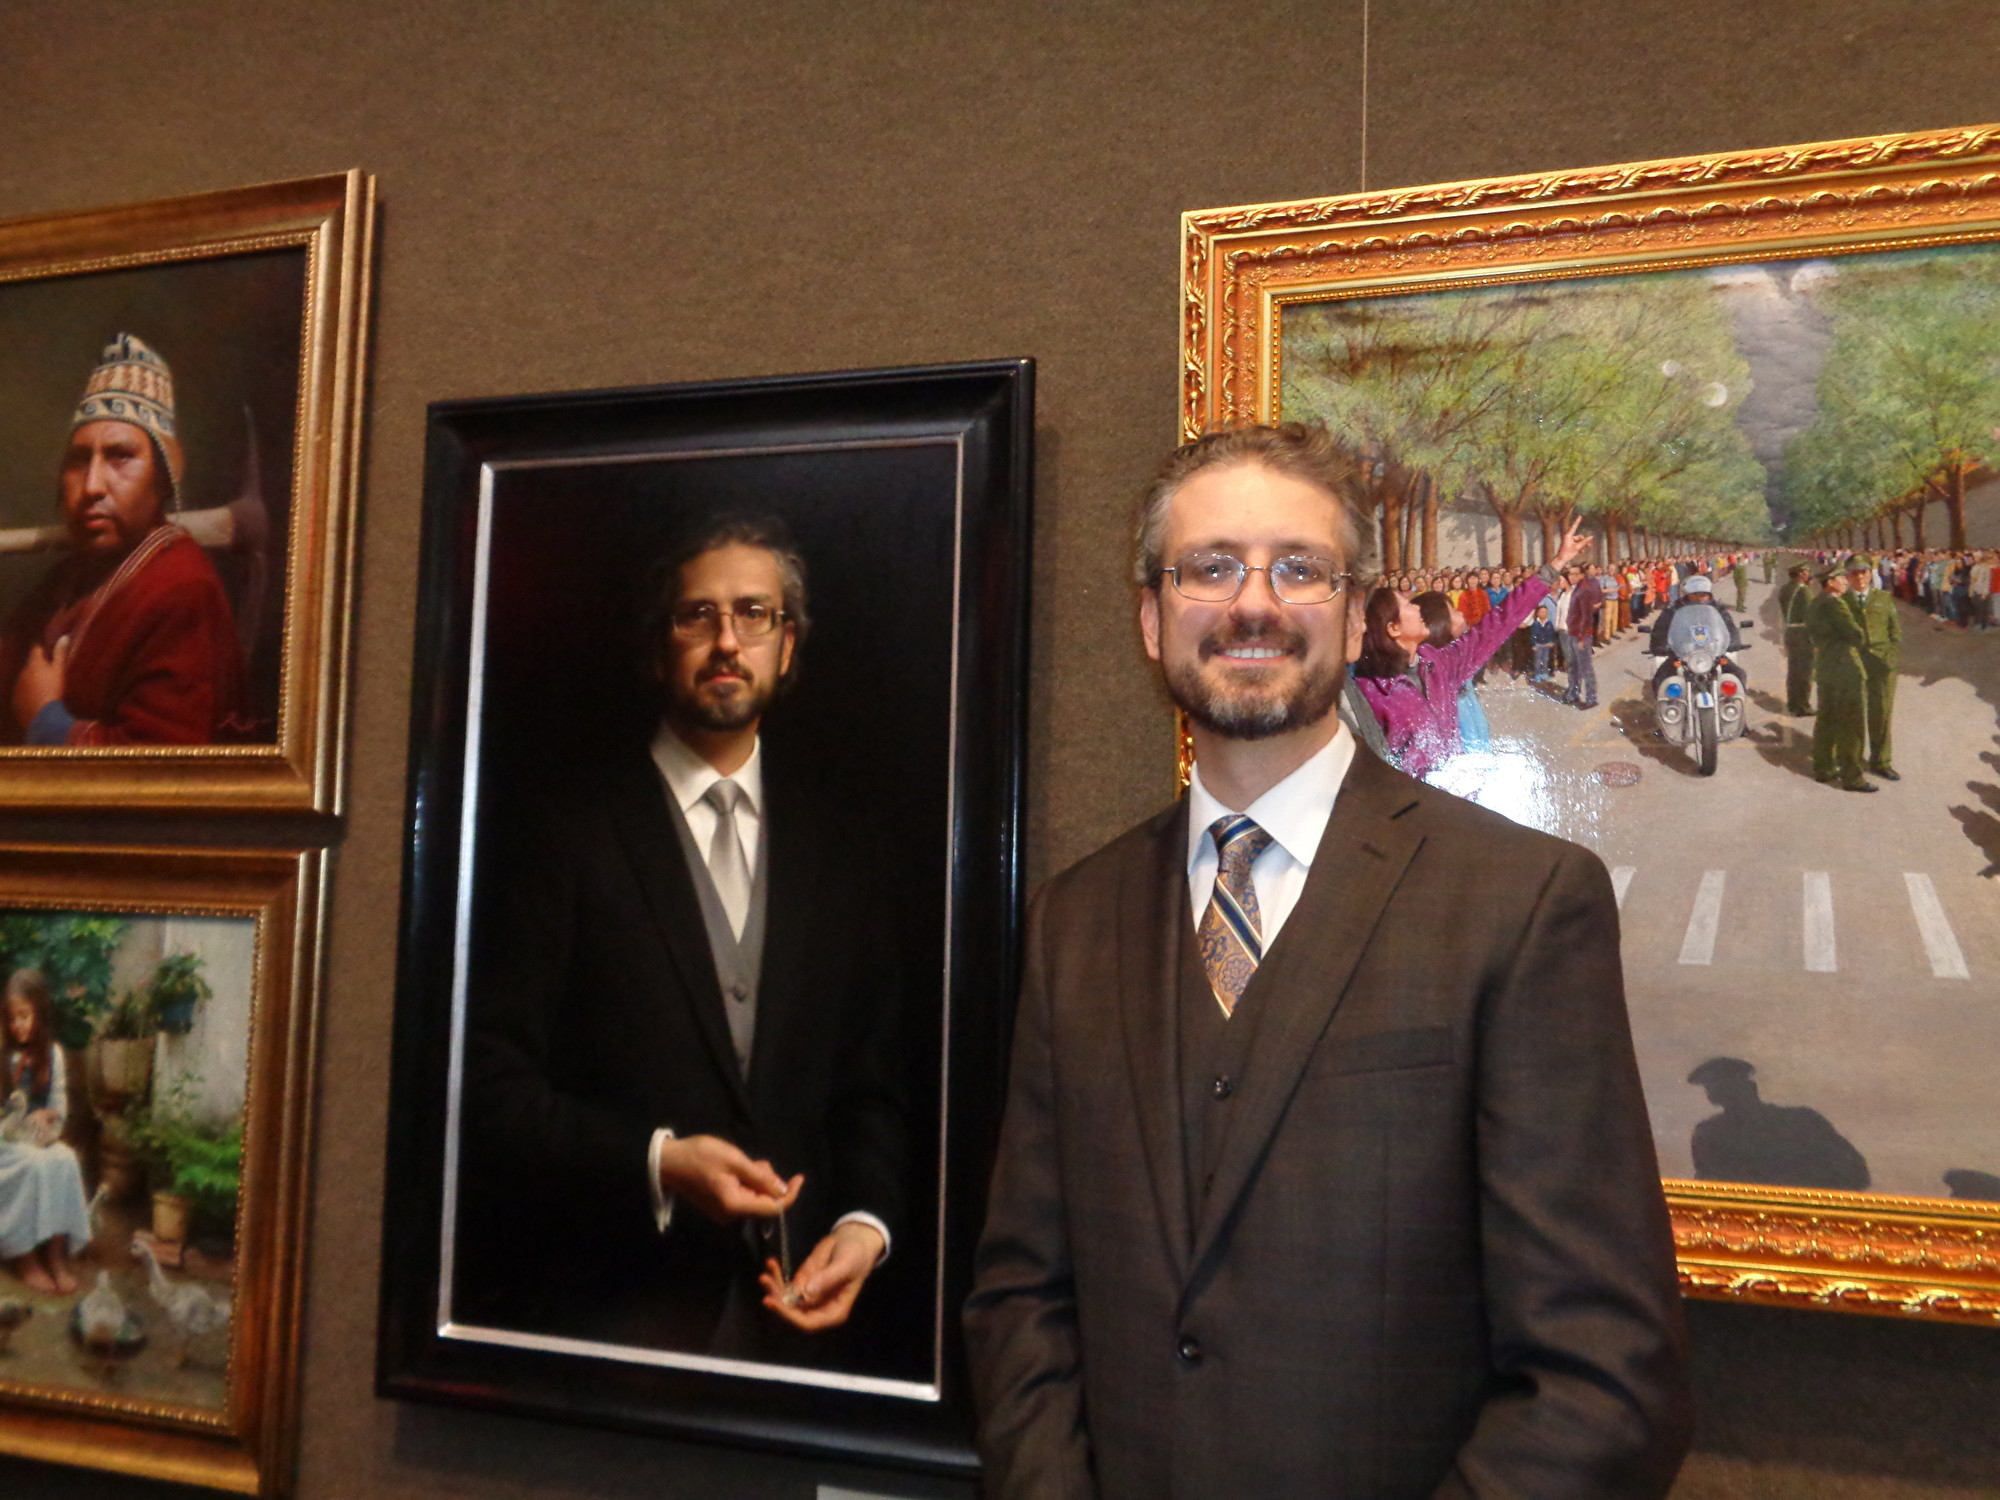 Joseph Daily與他的畫作《自畫像——準備禮拜》(Self Portrait Preparing for Worship)。(洪雅文/大紀元)